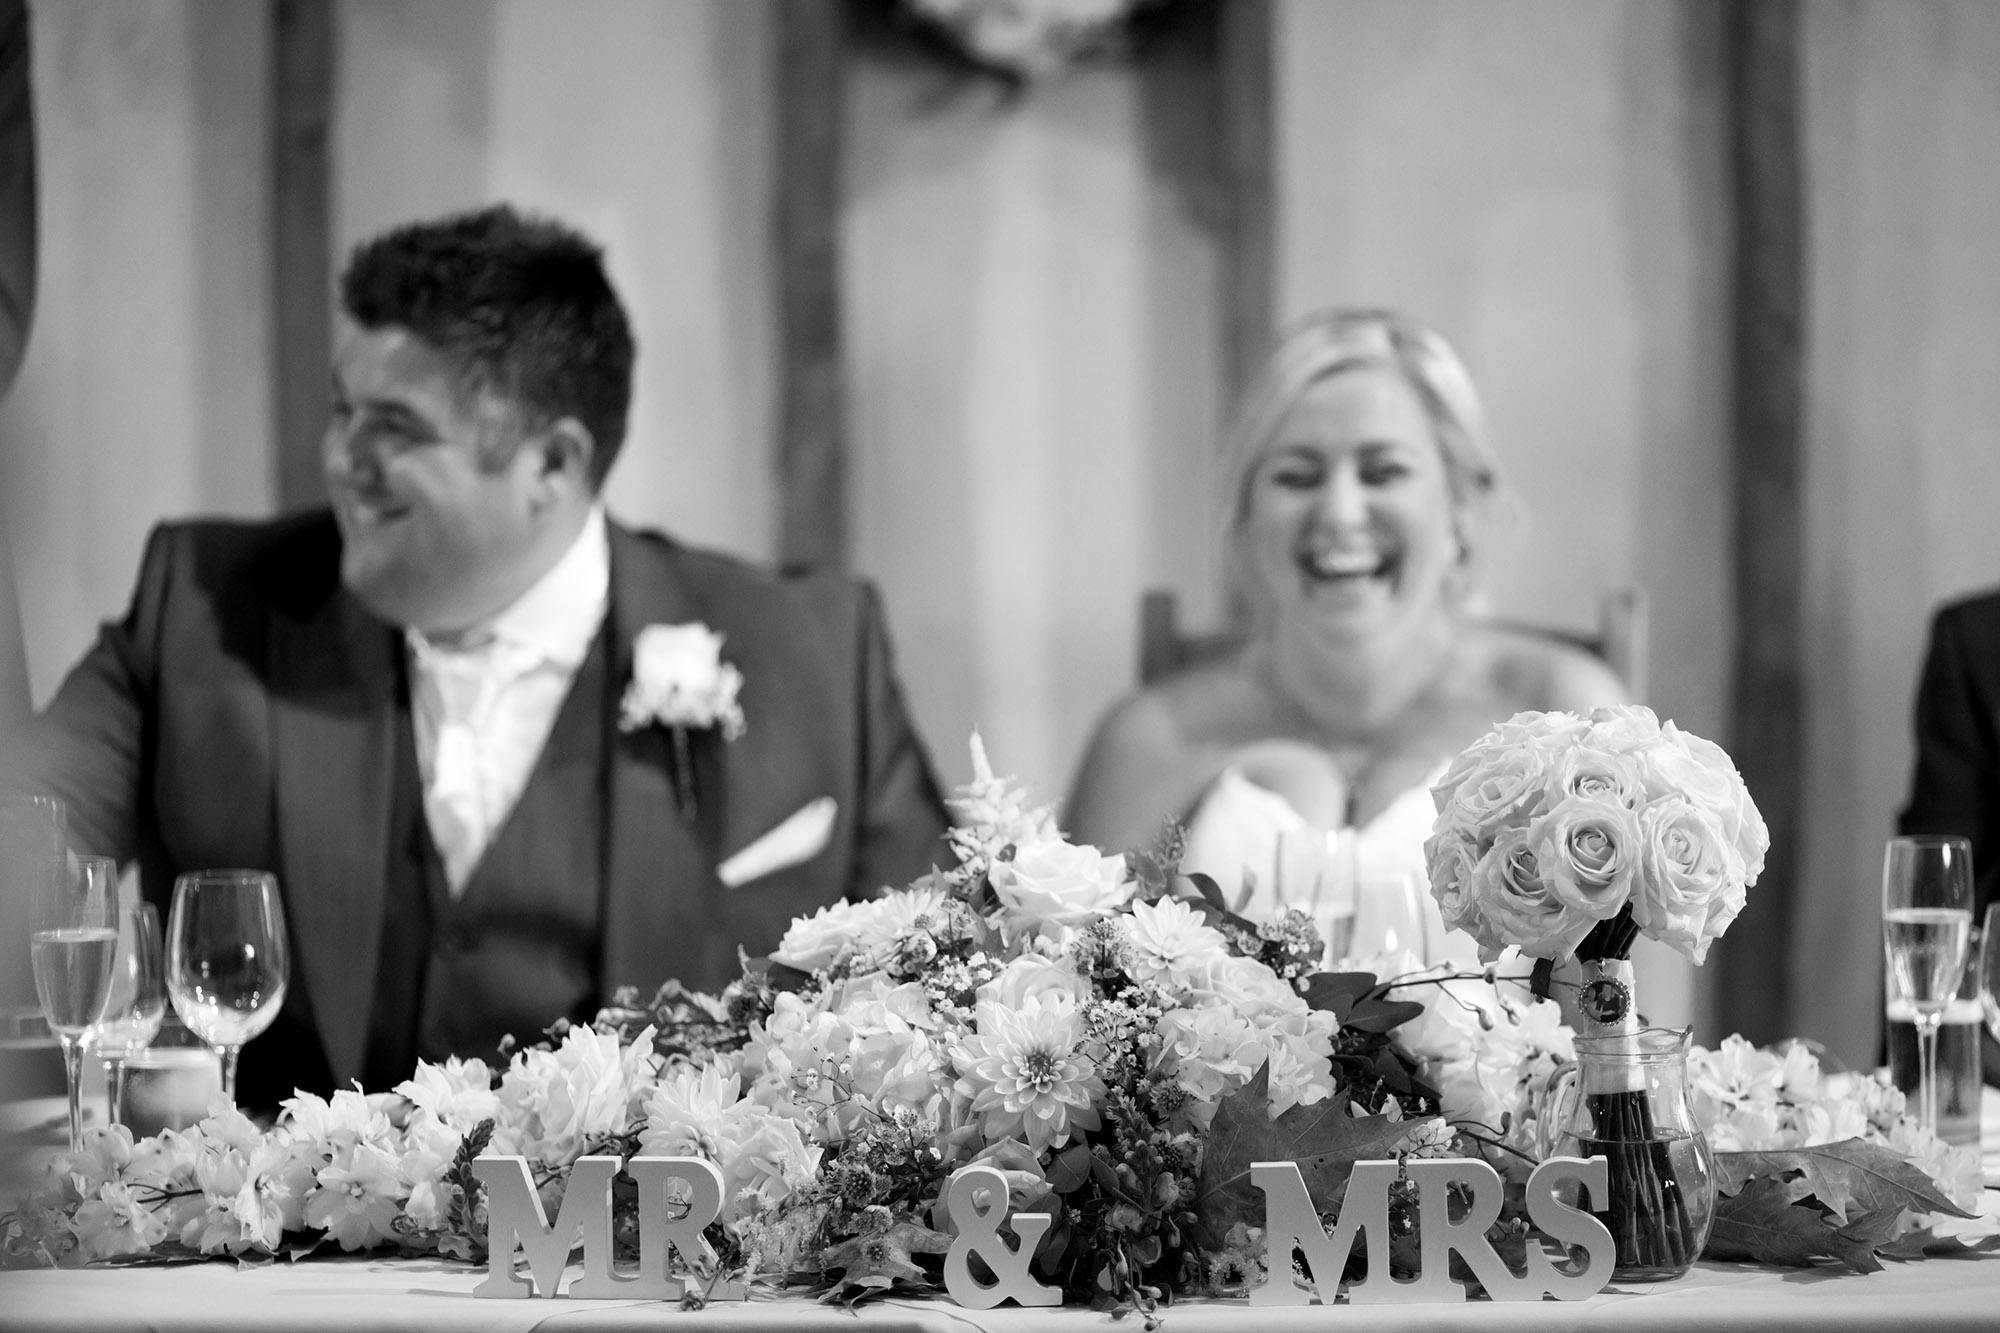 julia-toms-wedding-photographer-west-sussex-010.jpg